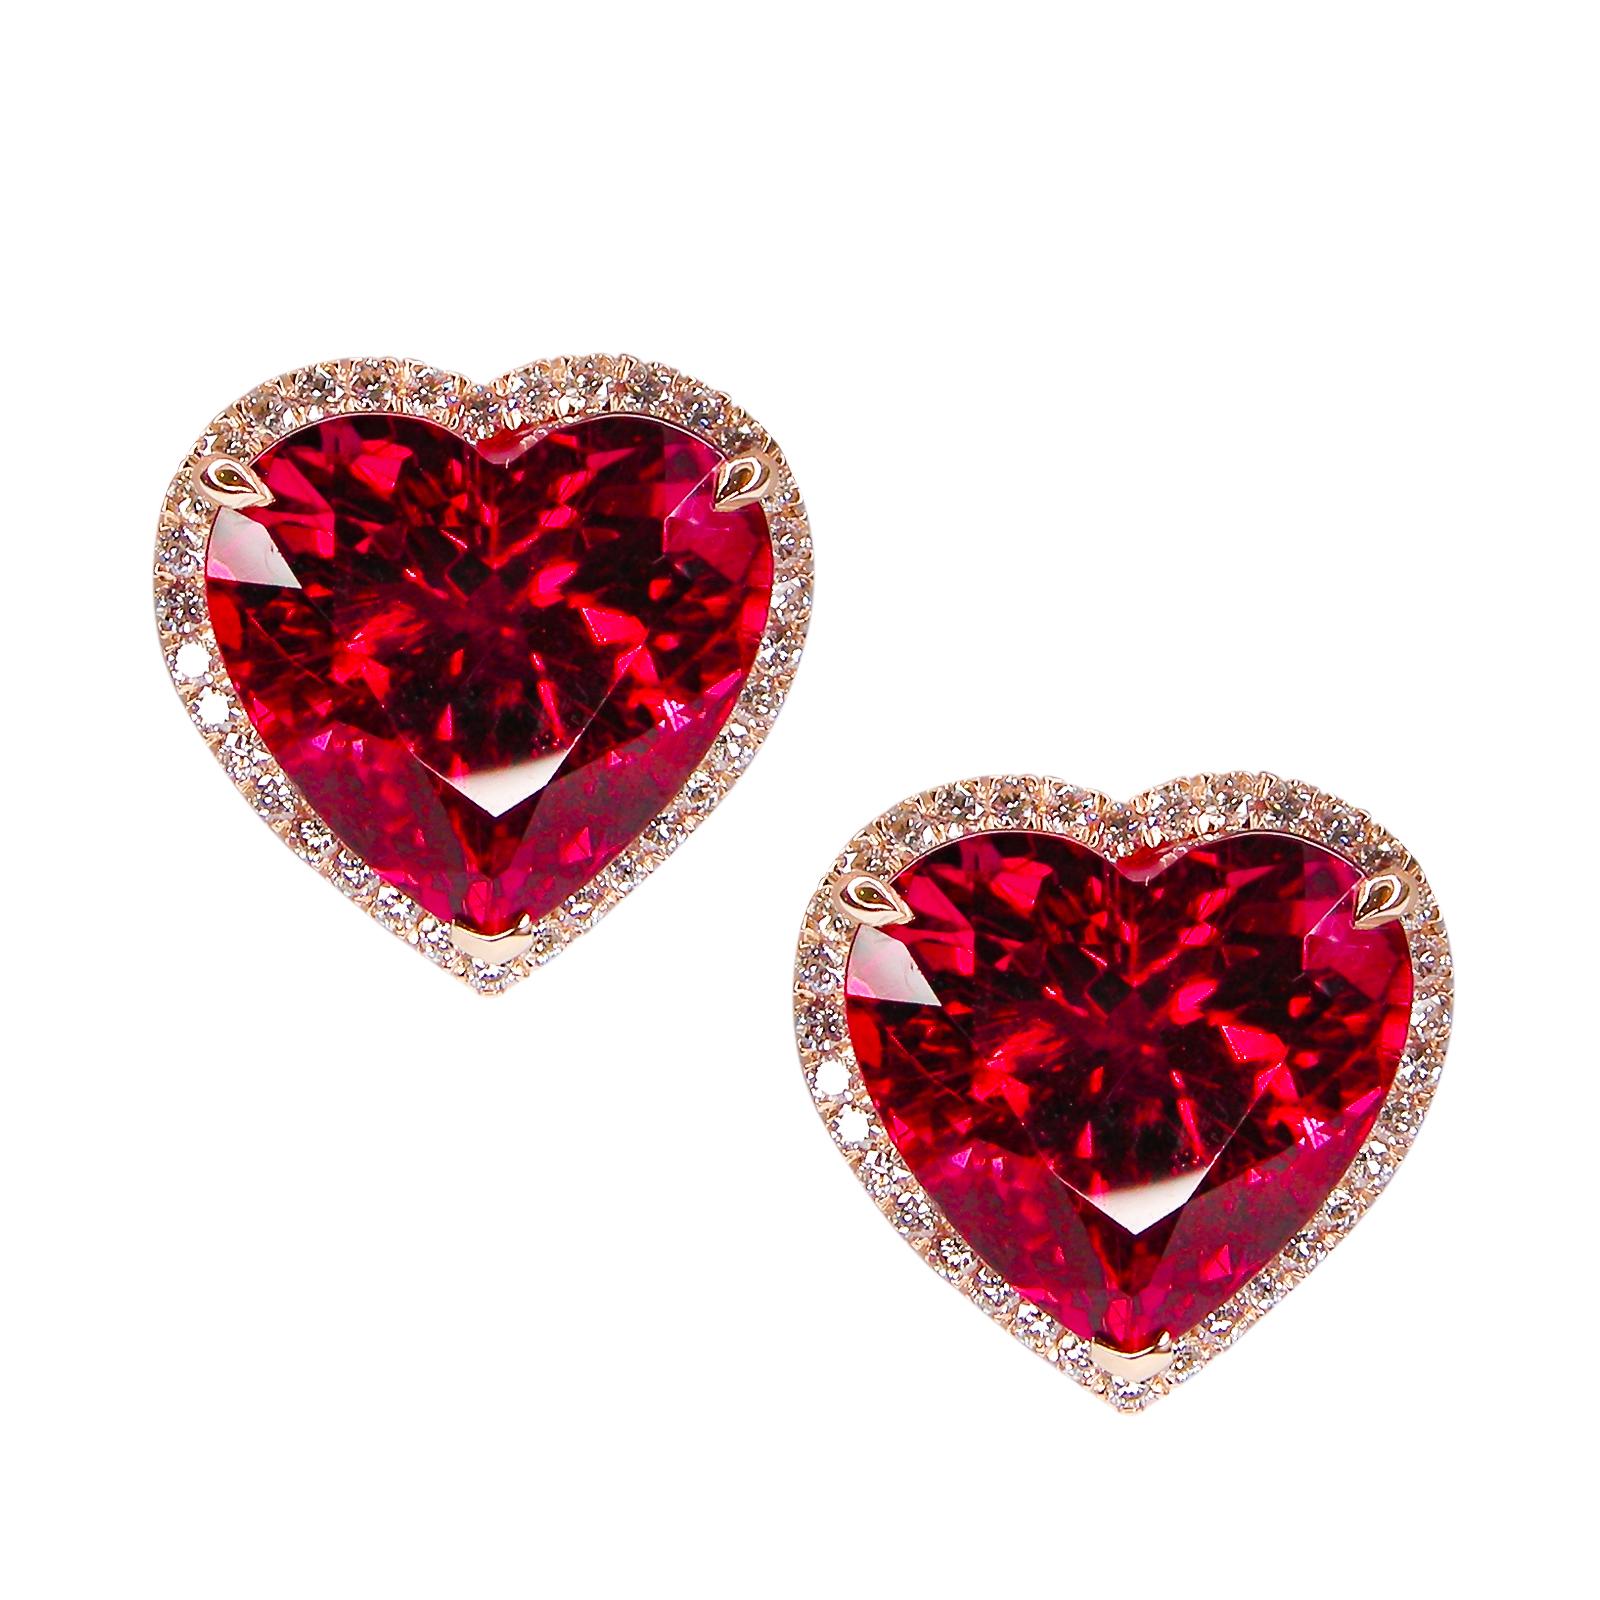 RUBELLITE TOURMALINE AND DIAMOND EARRINGS WITH HIDDEN DIAMOND HALO